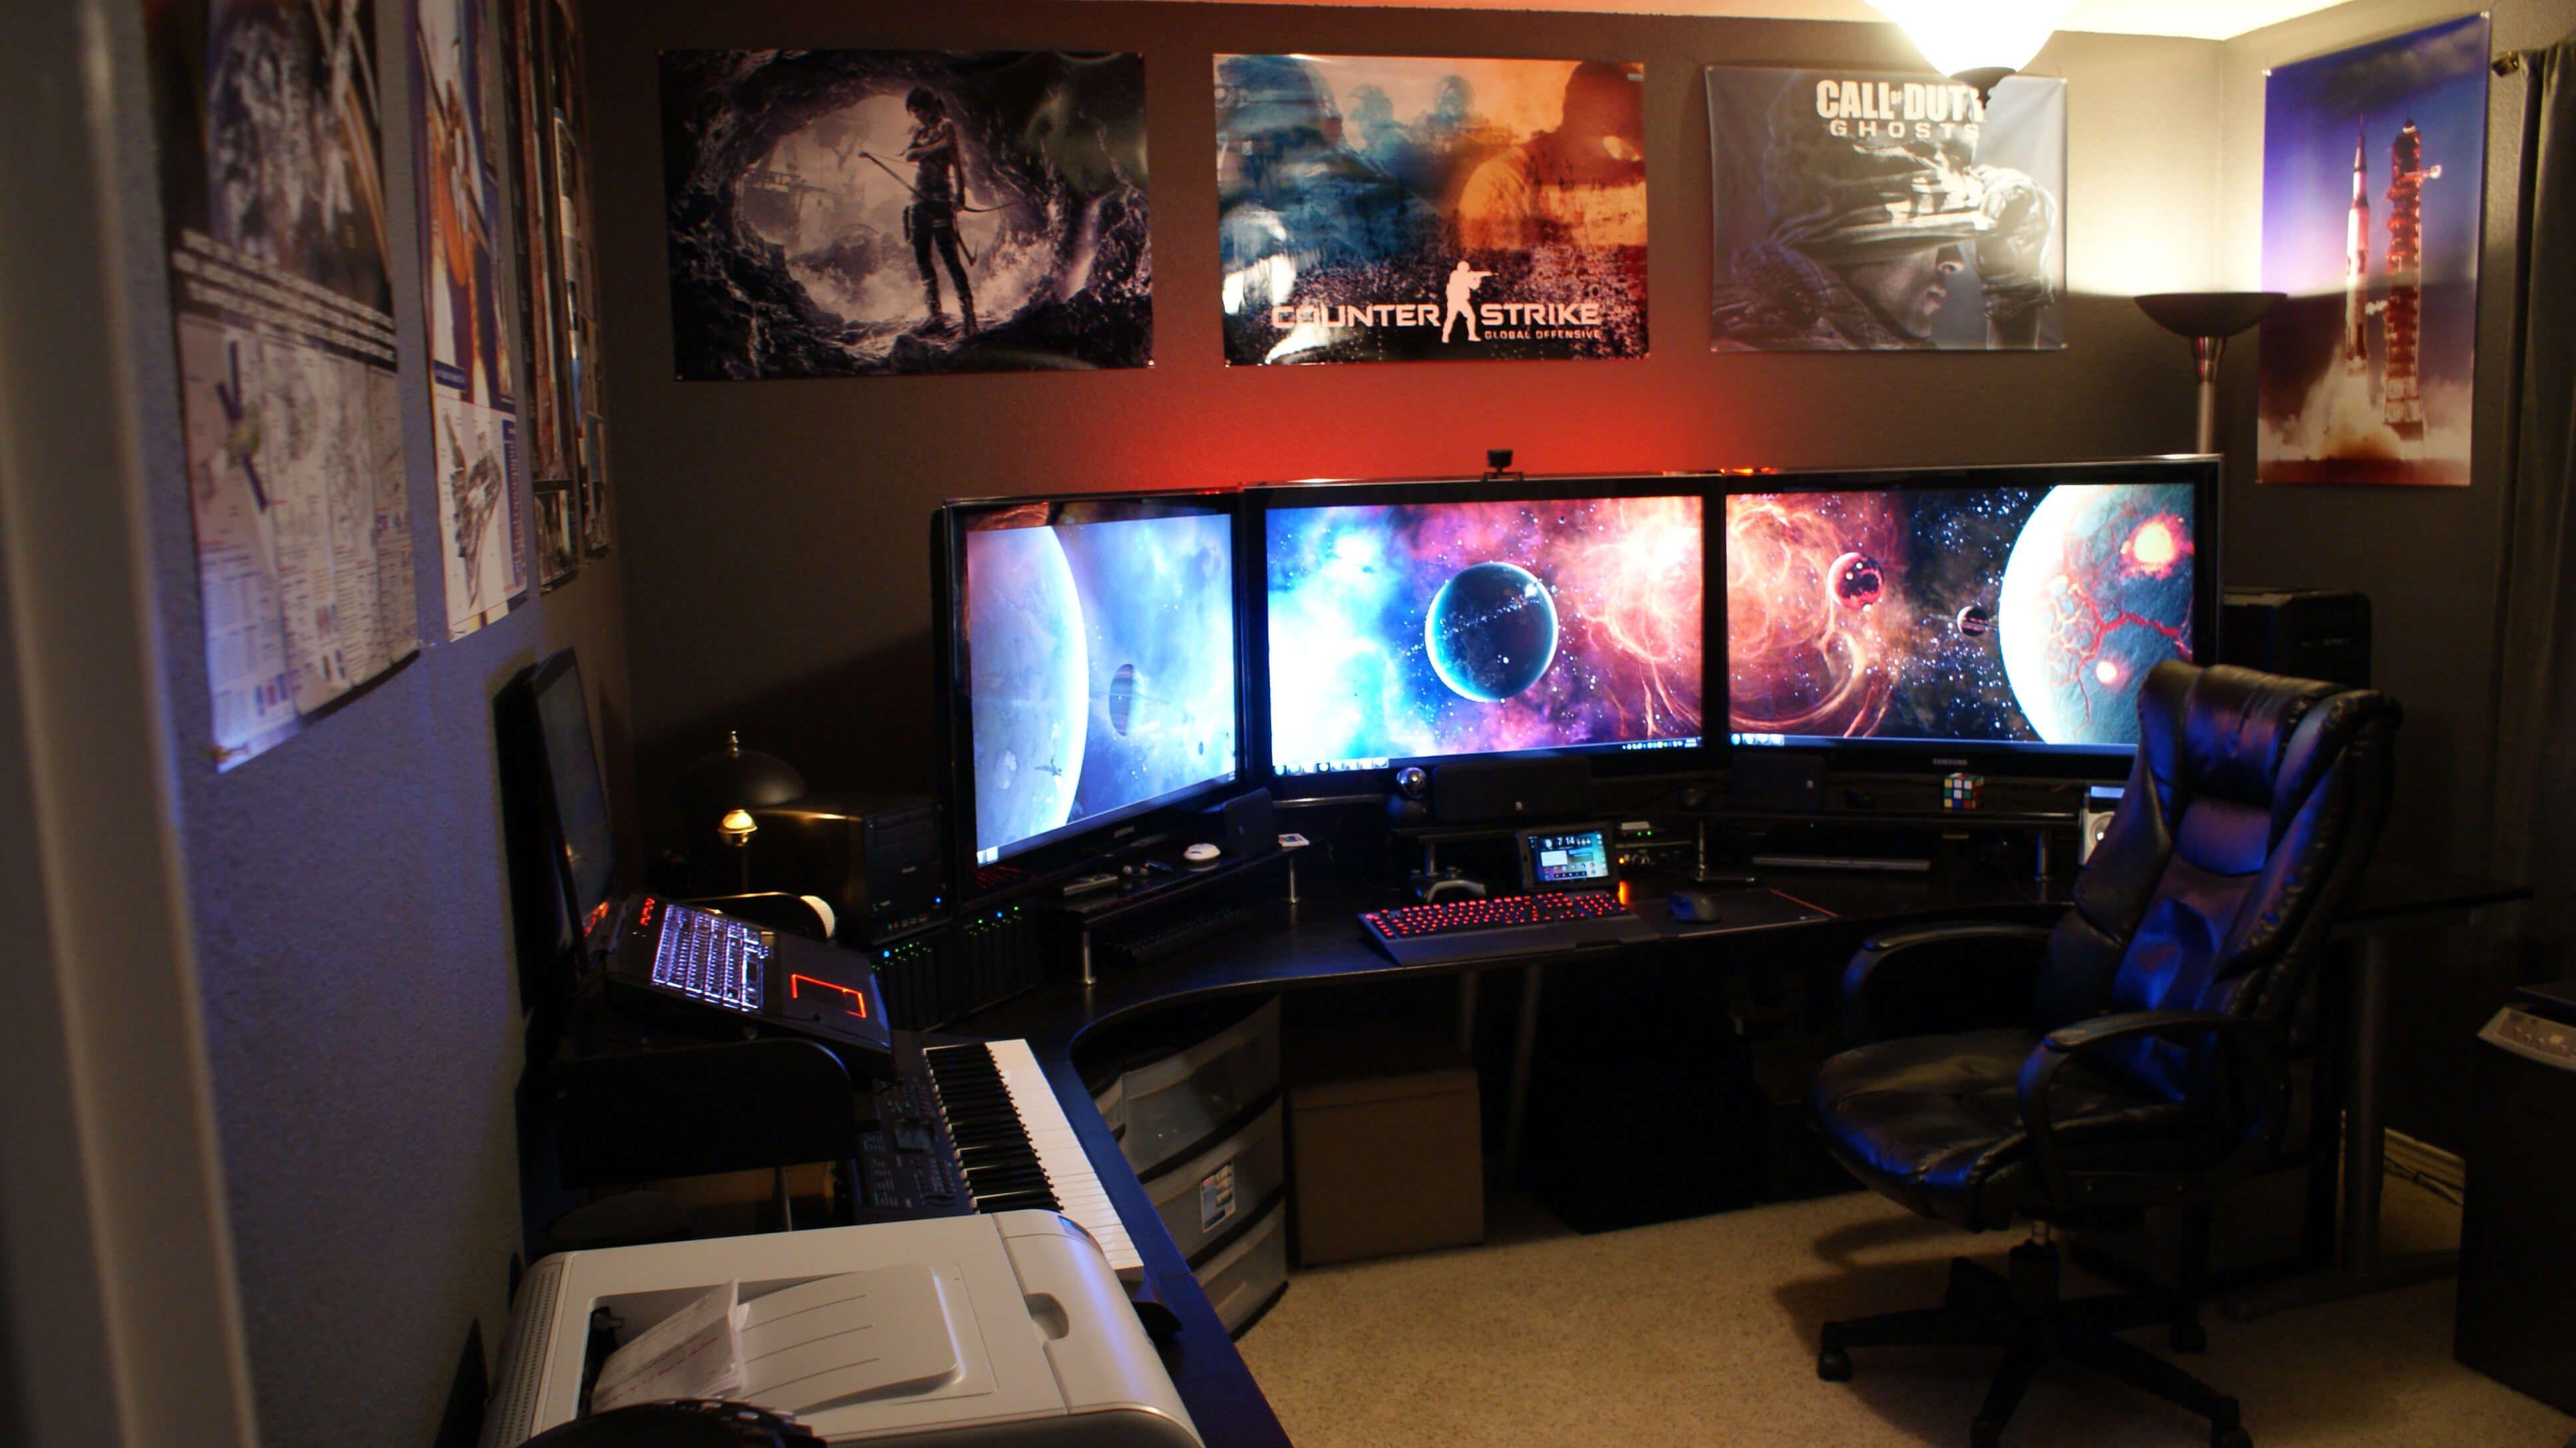 50 Best Setup Of Video Game Room Ideas A Gamer S Guide Kiến Trúc Chơi Game Phòng Chơi